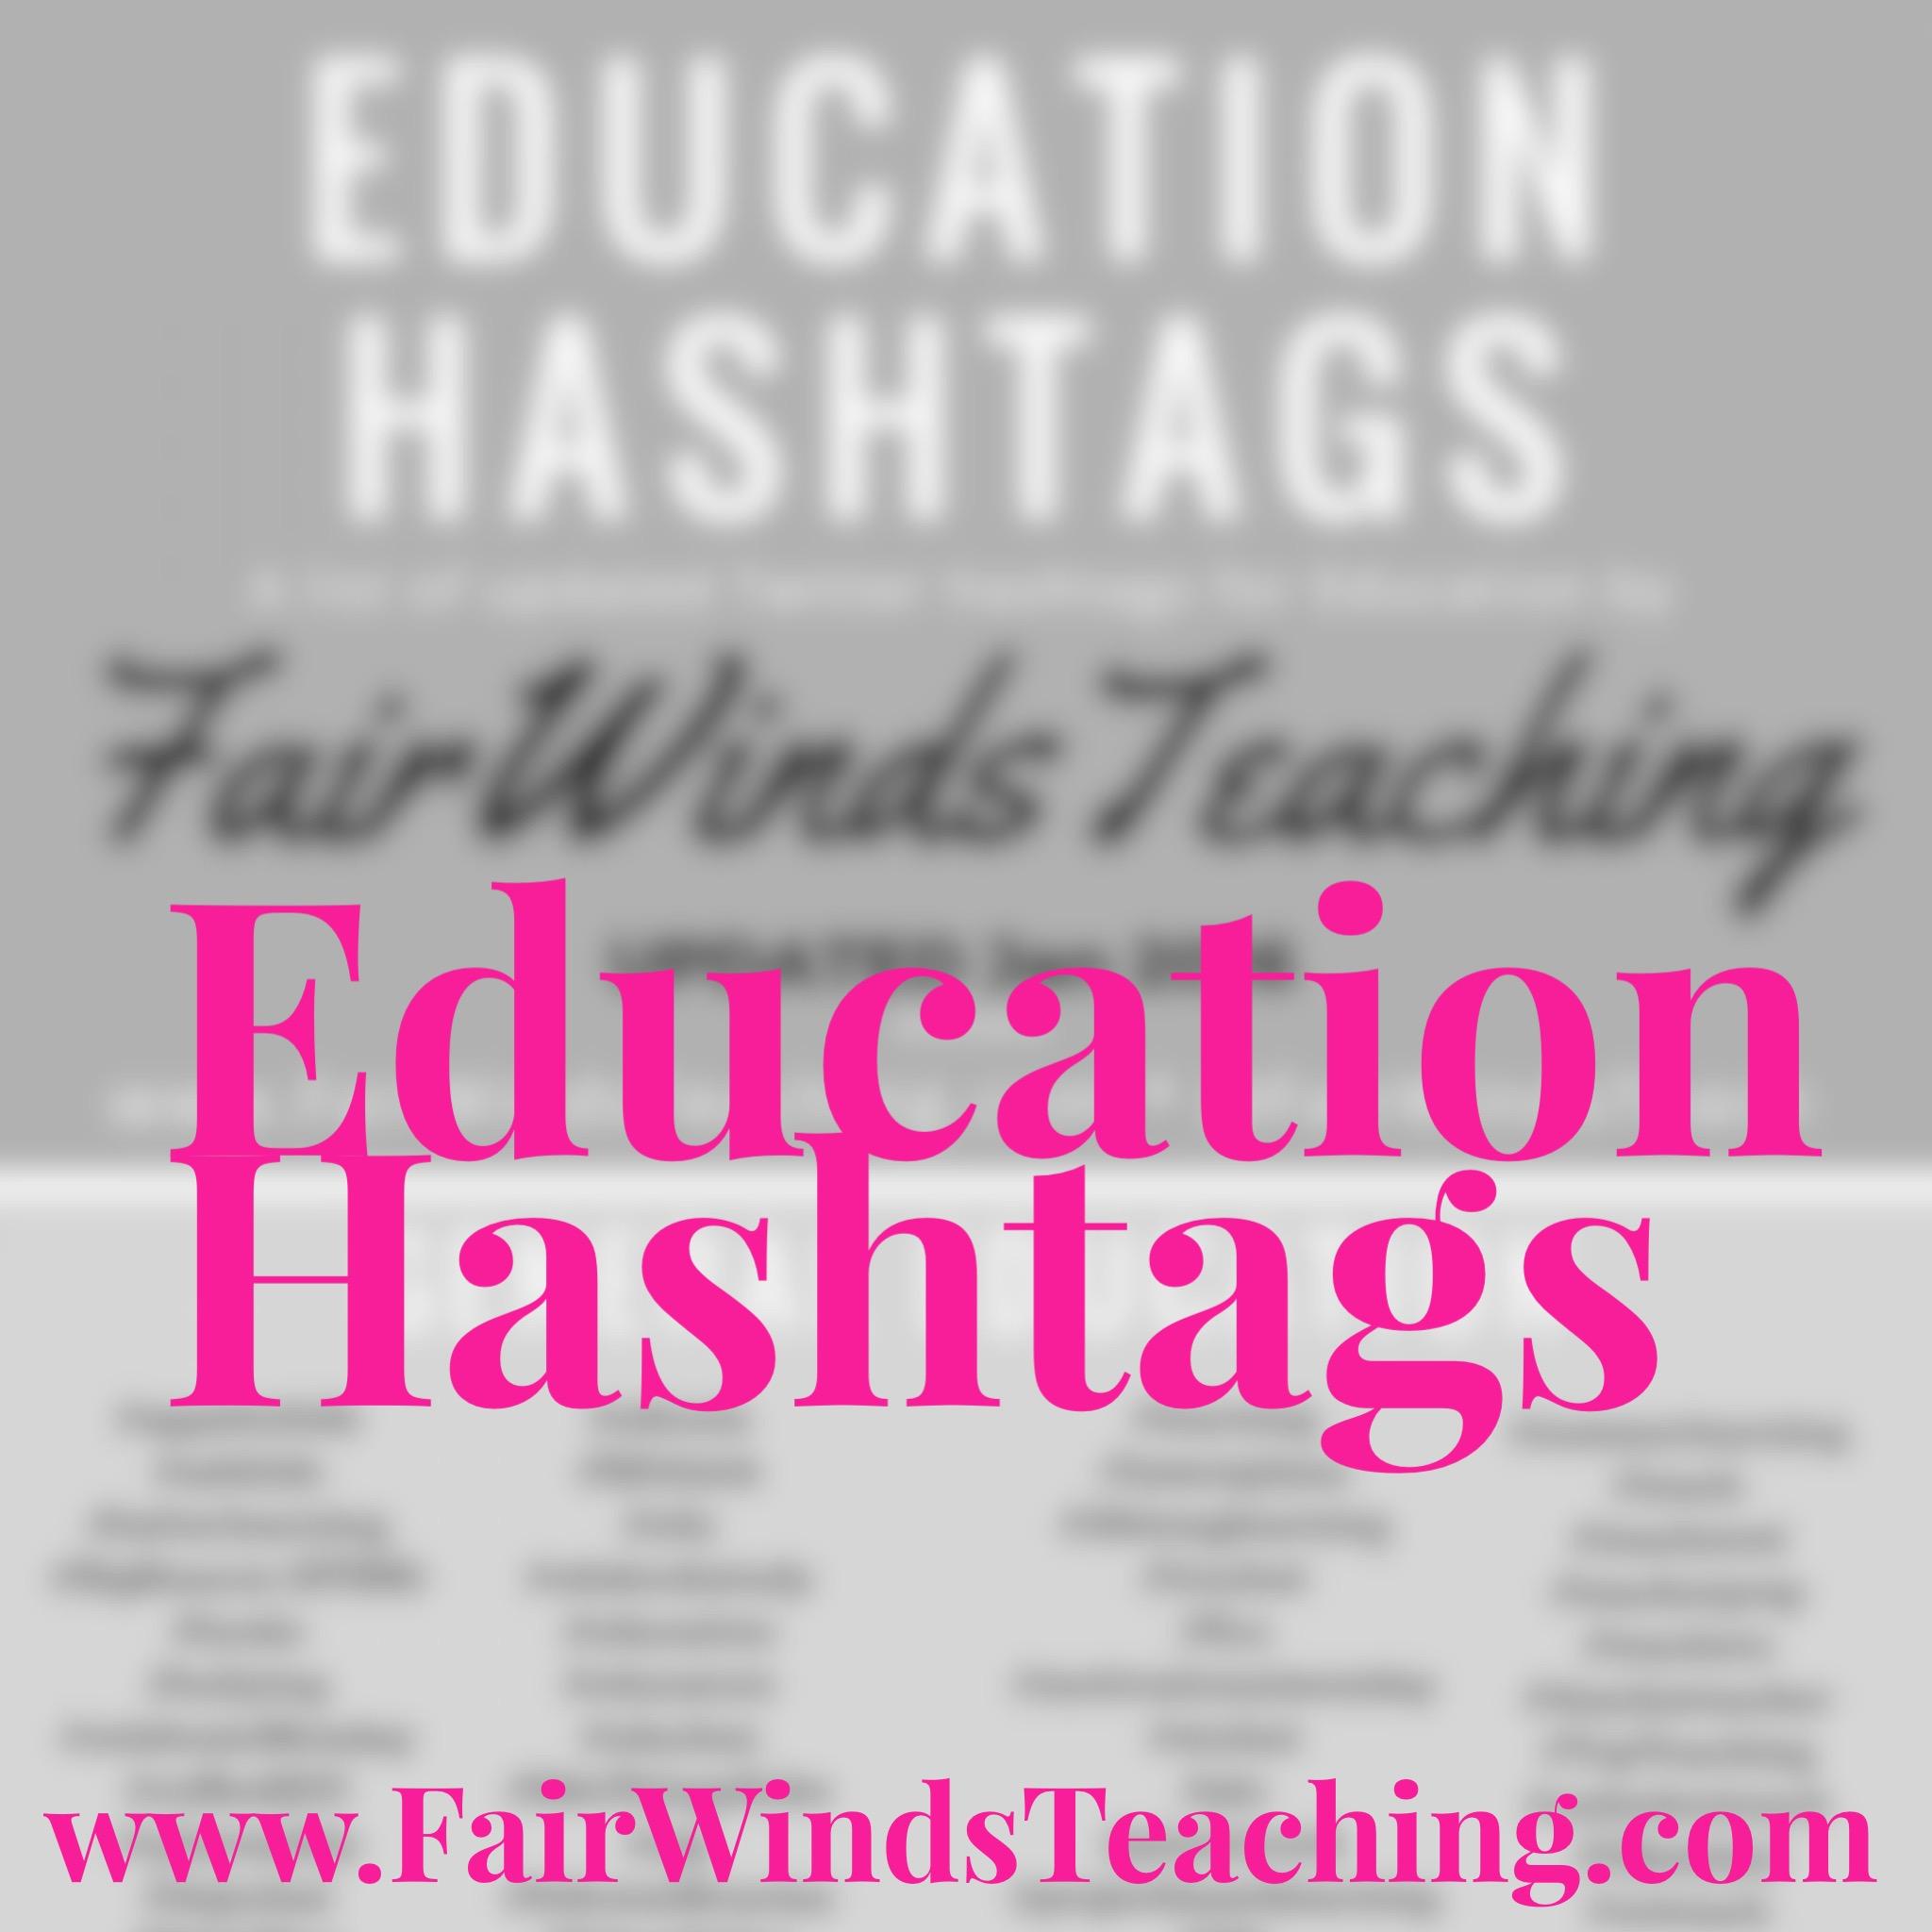 Education Hashtags – General